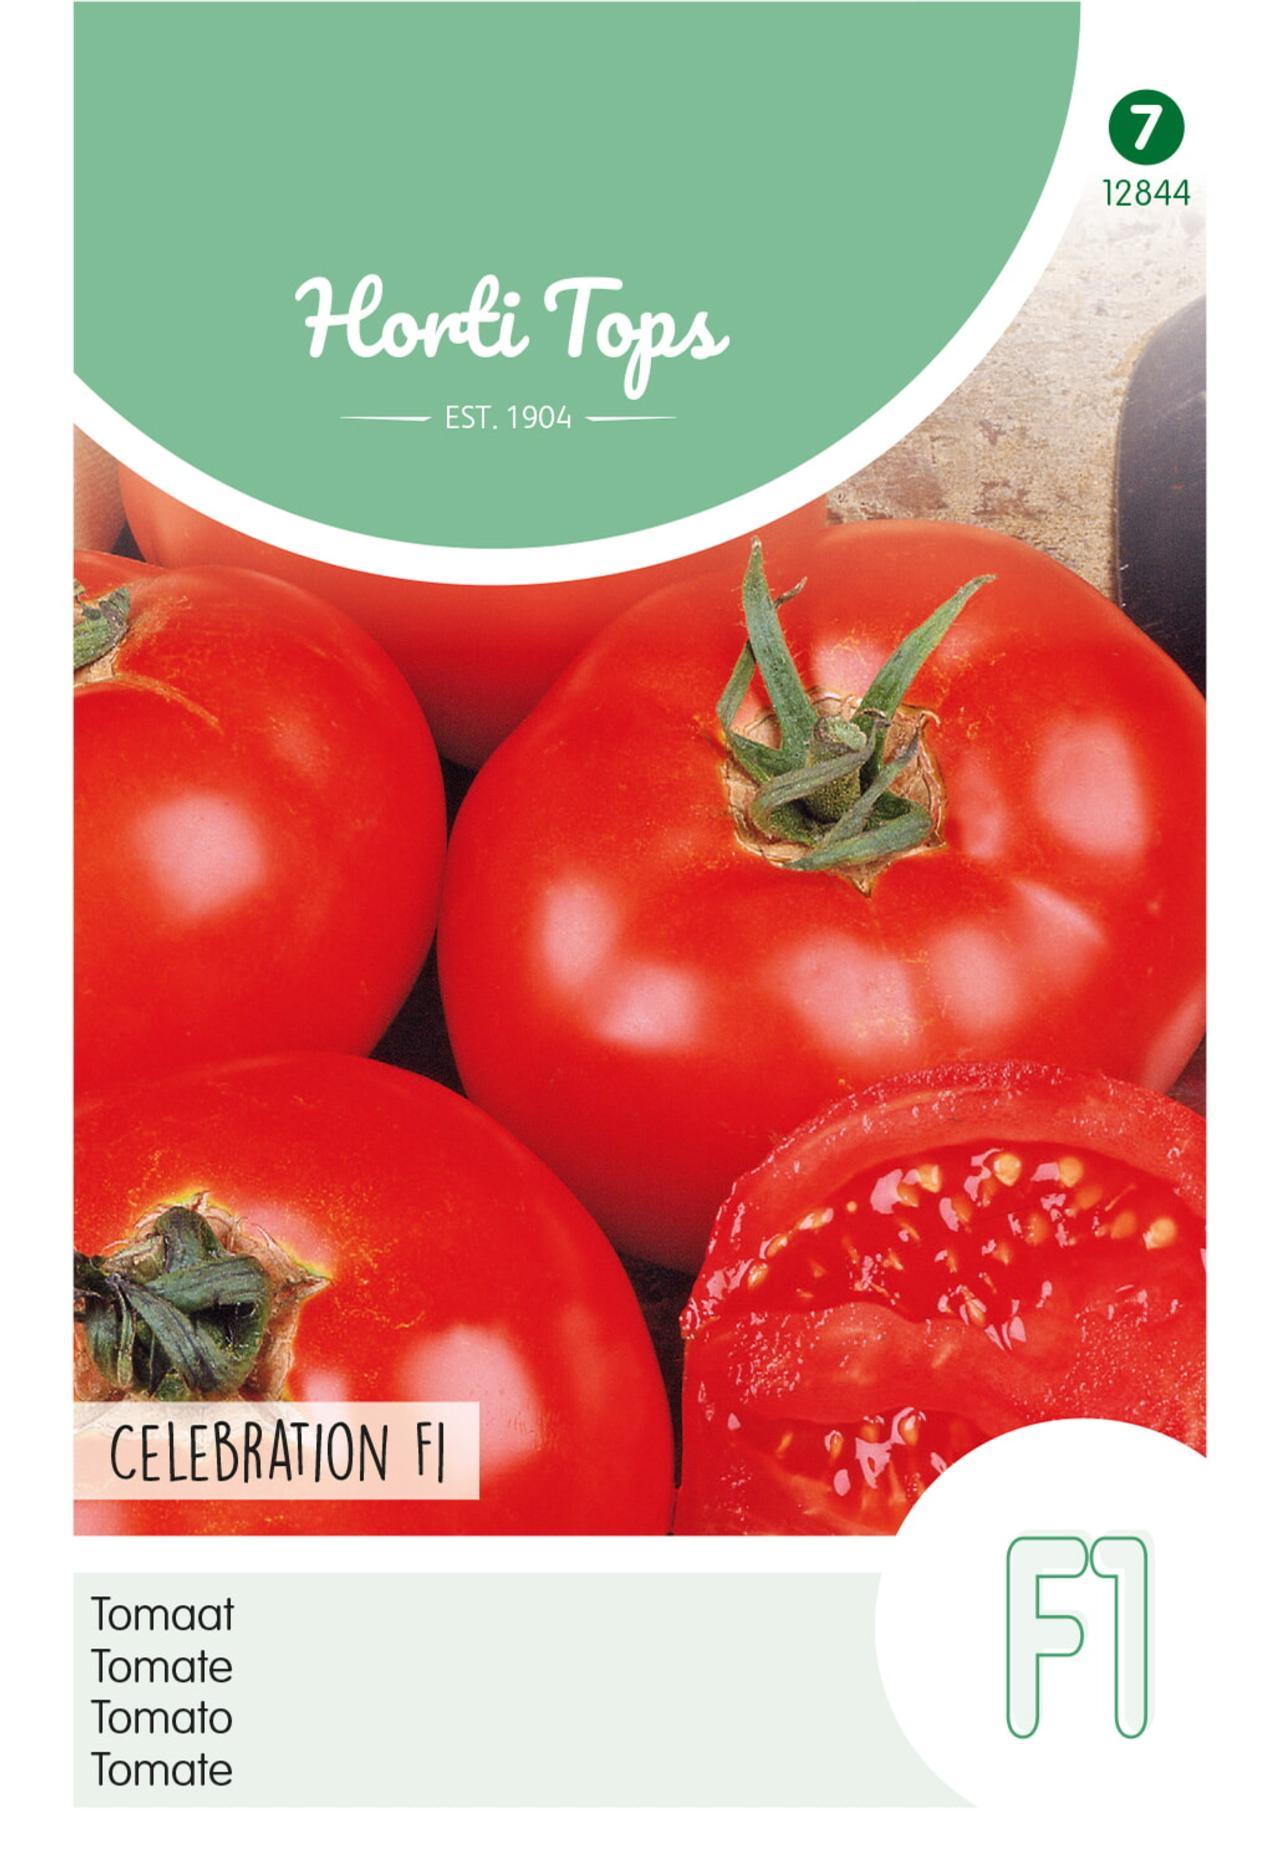 Solanum lycopersicum 'Celebration F1' plant